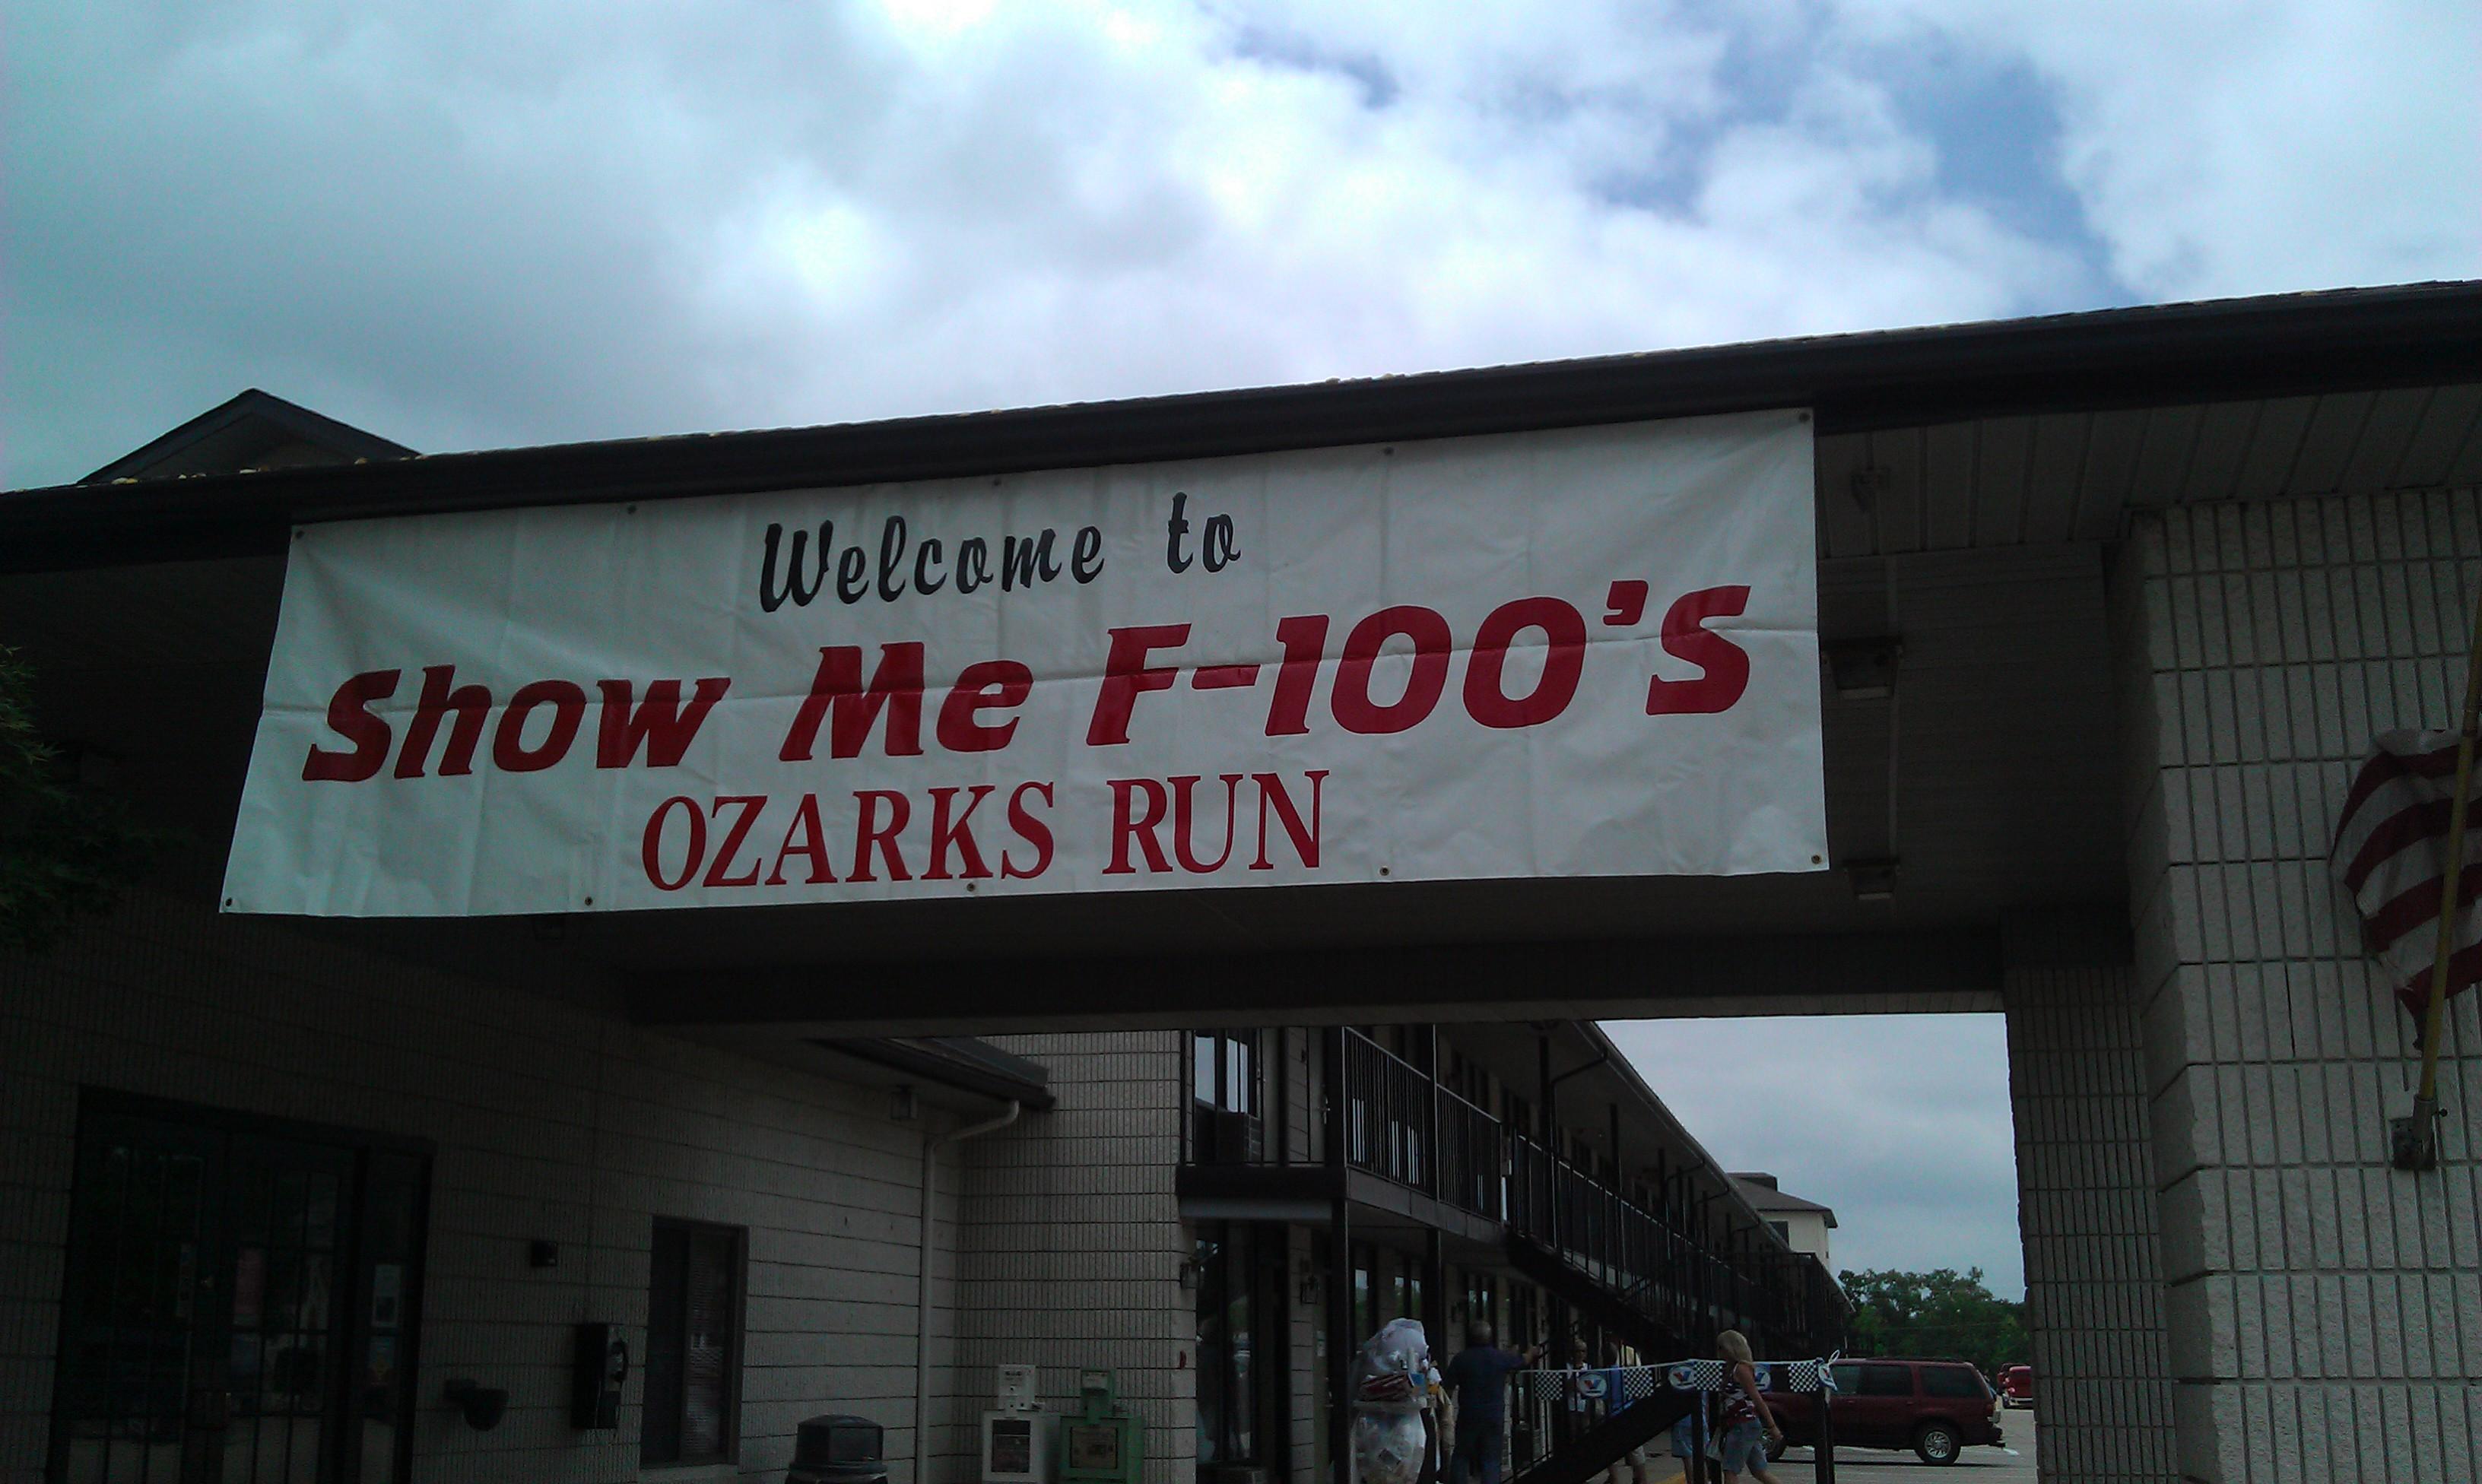 2011 Show Me F-100's Annual